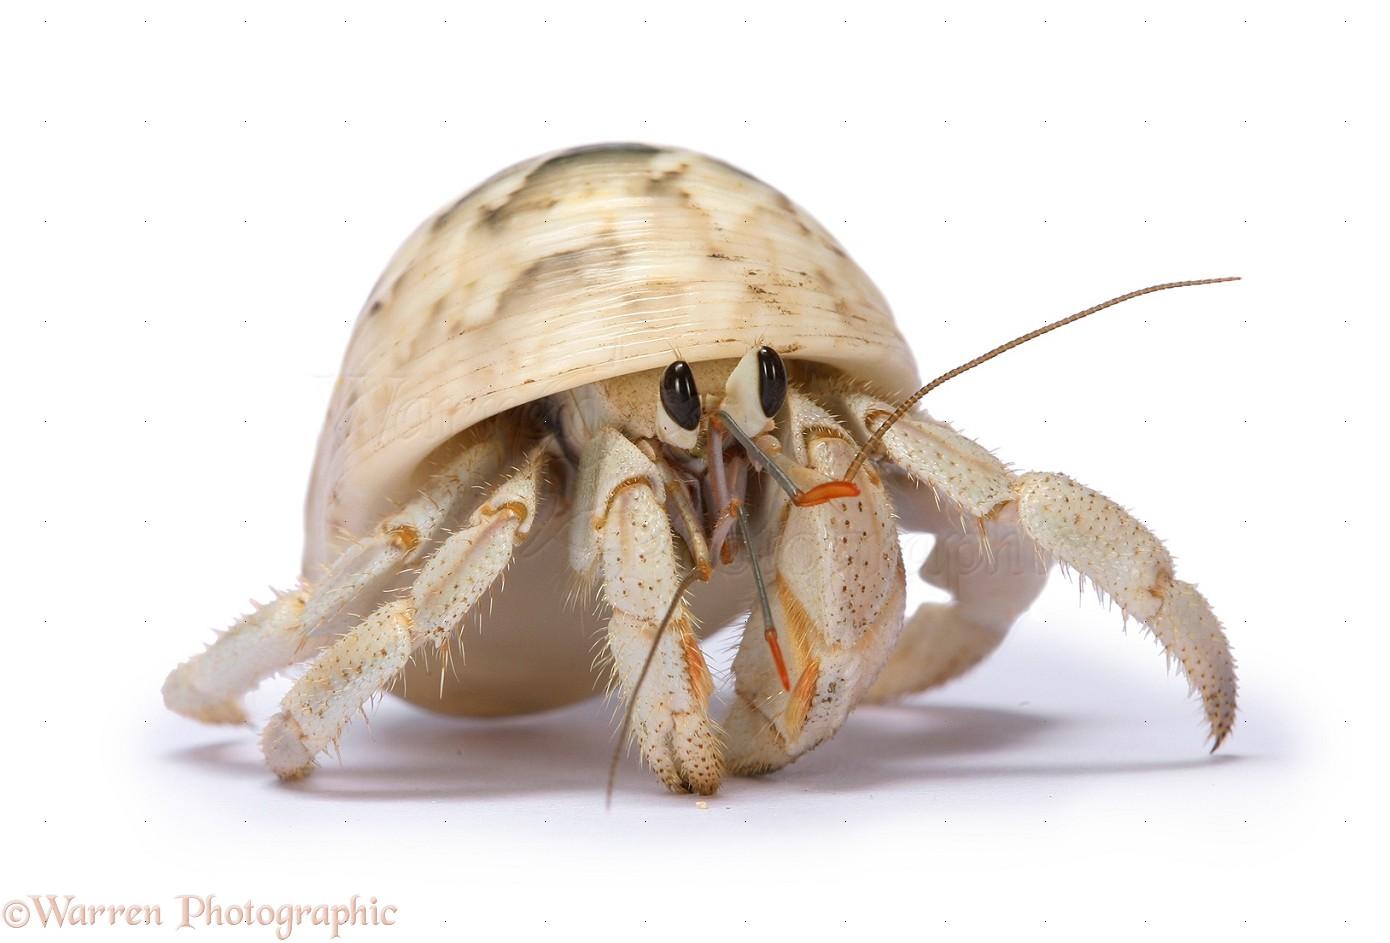 Hermit crab - photo#20